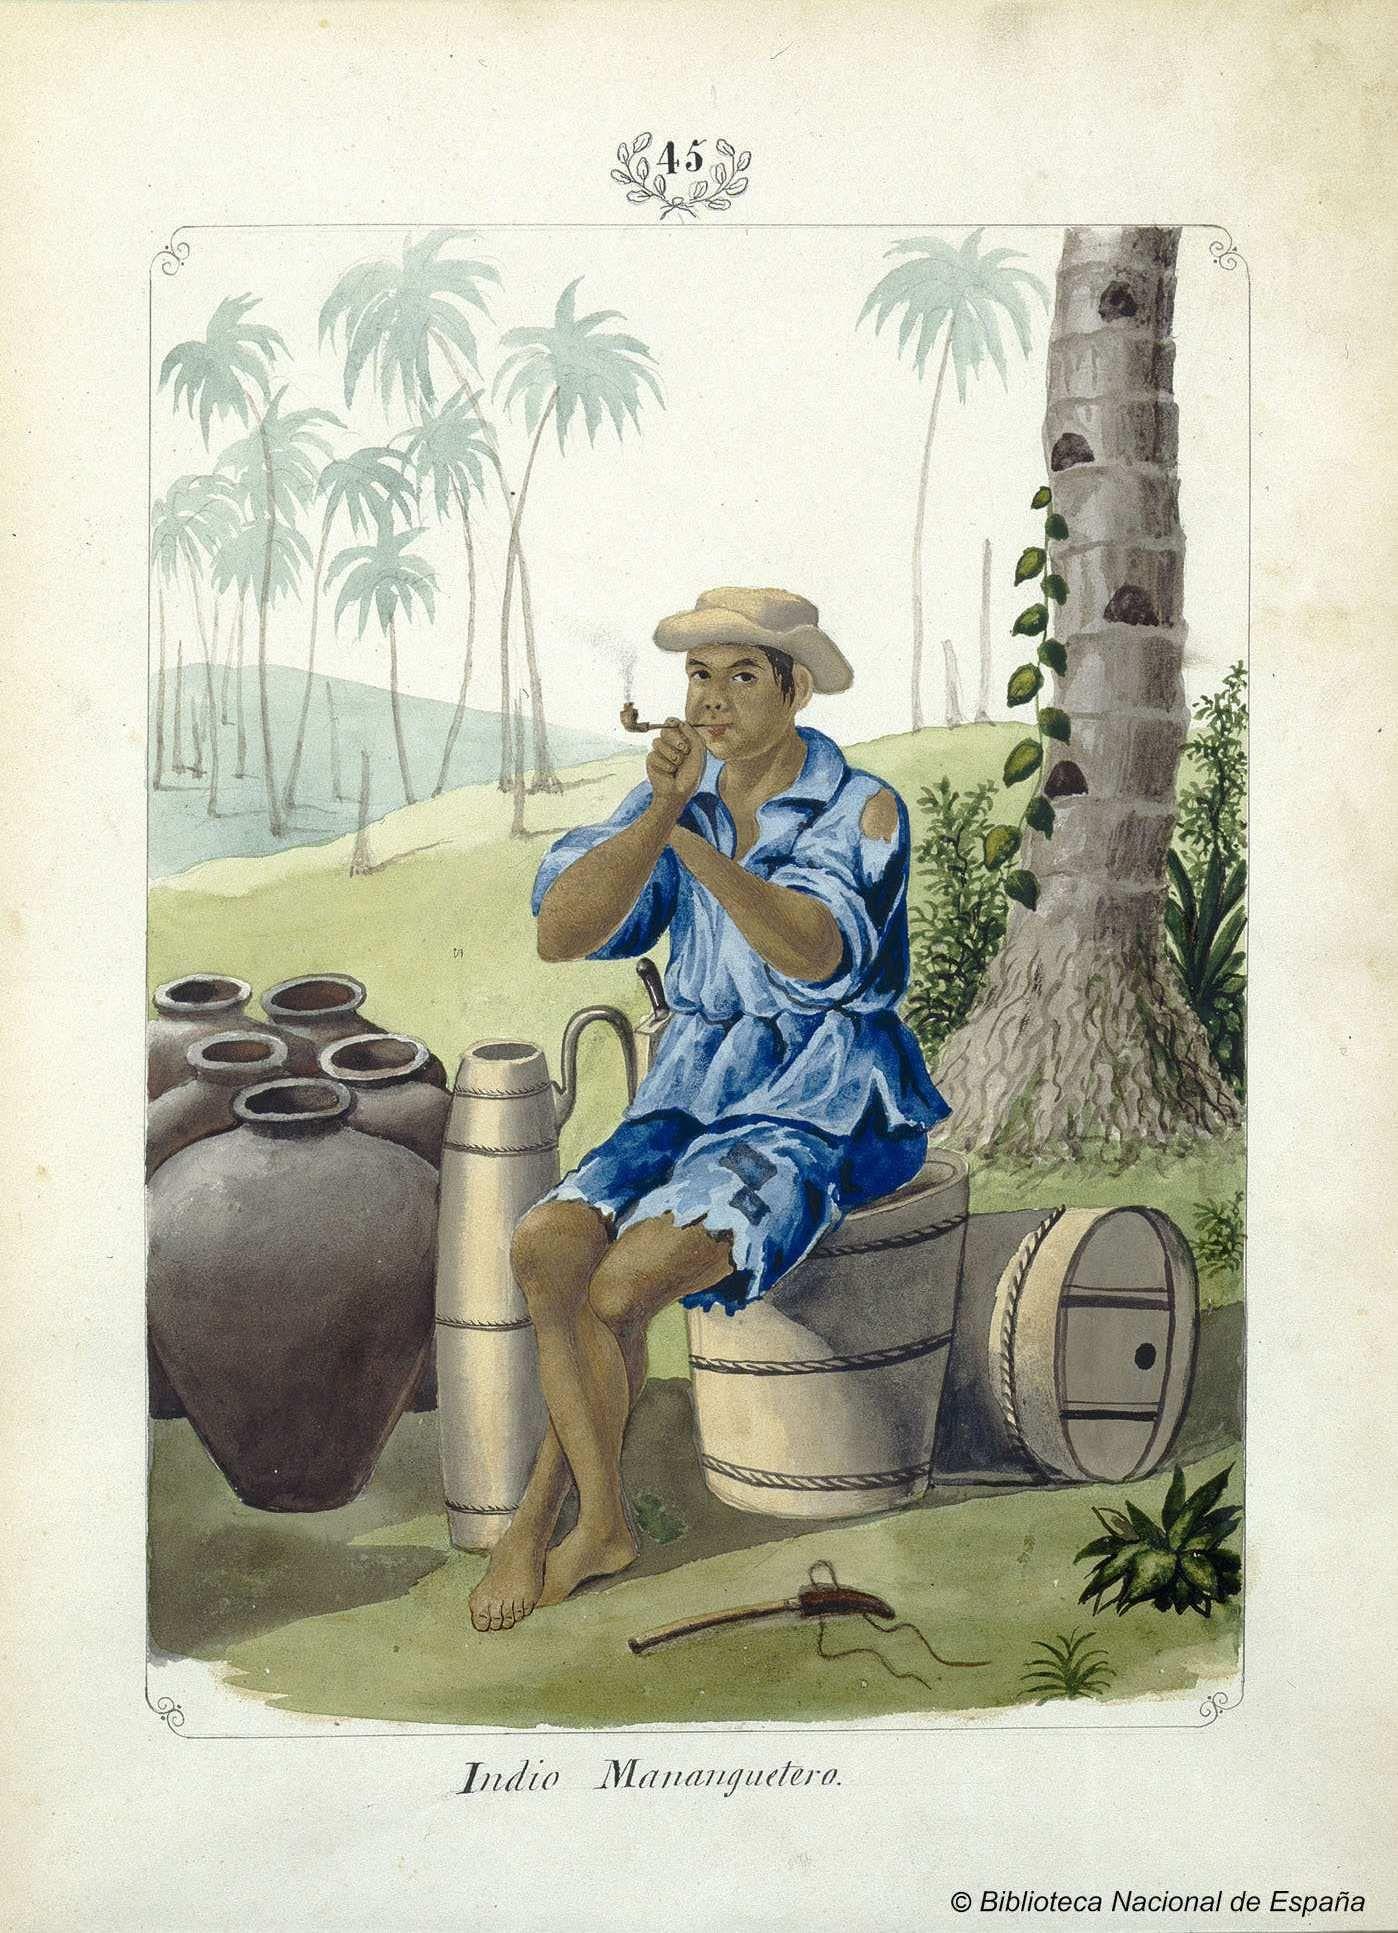 Indio Mananguetero. Lozano, José Honorato 1821- — Dibujo — 1847